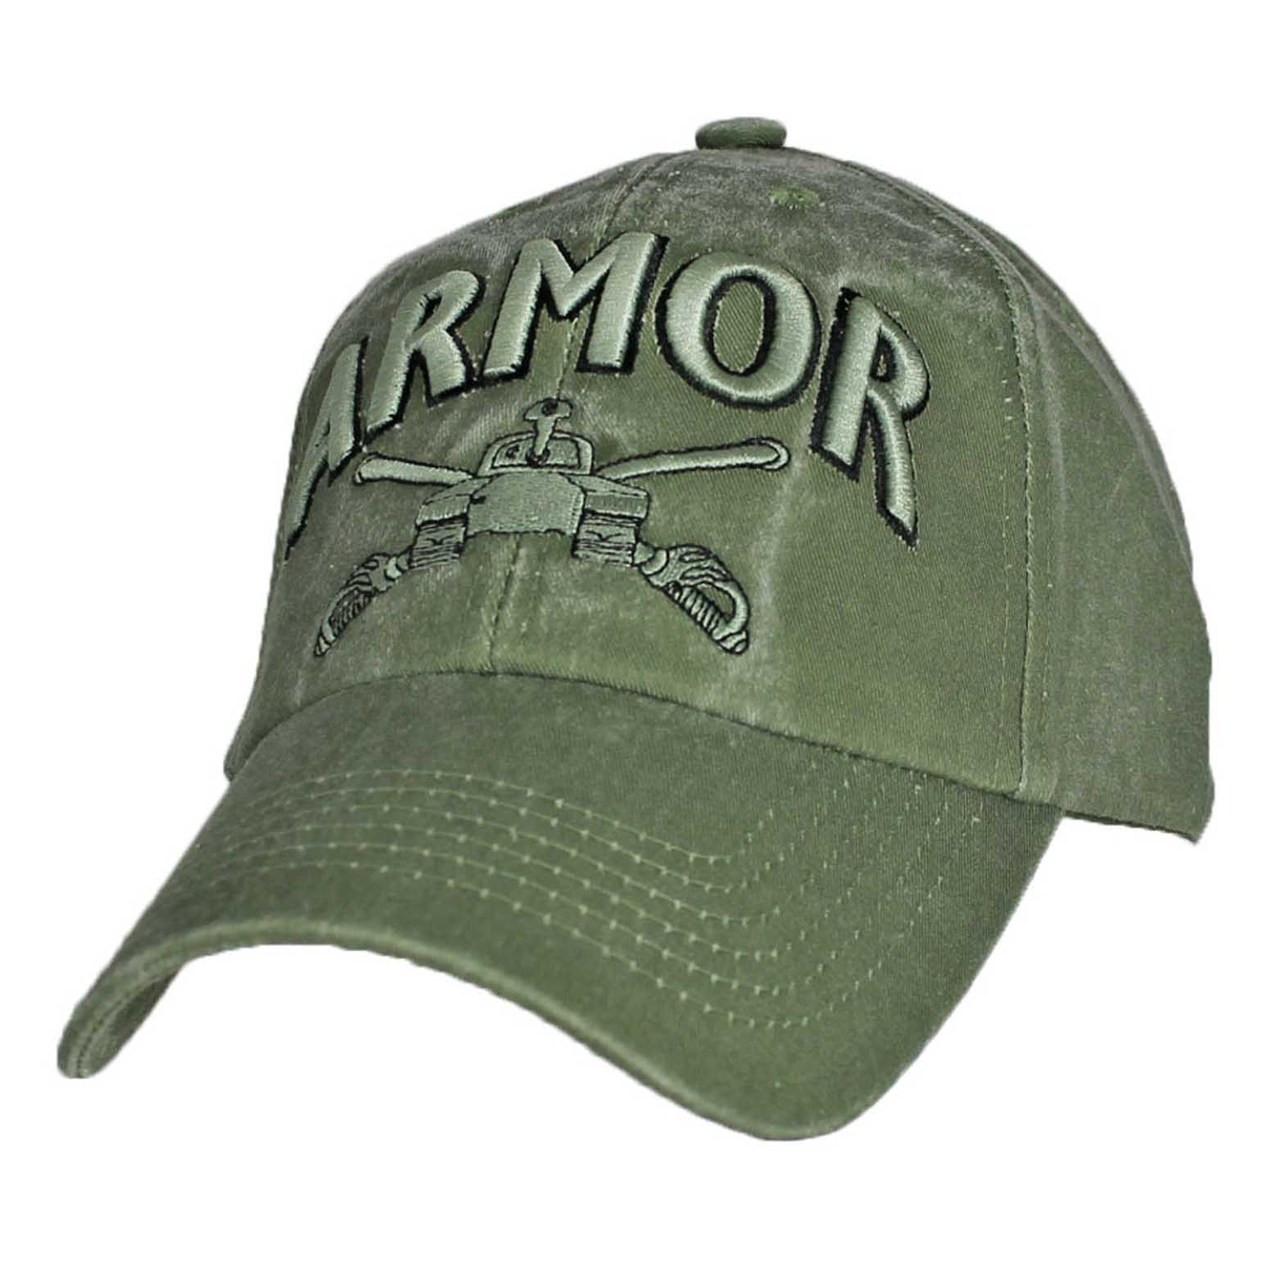 US ARMY ARMOR - U.S. Army Tank OD Green Military Baseball Cap Hat 29f03855cbd